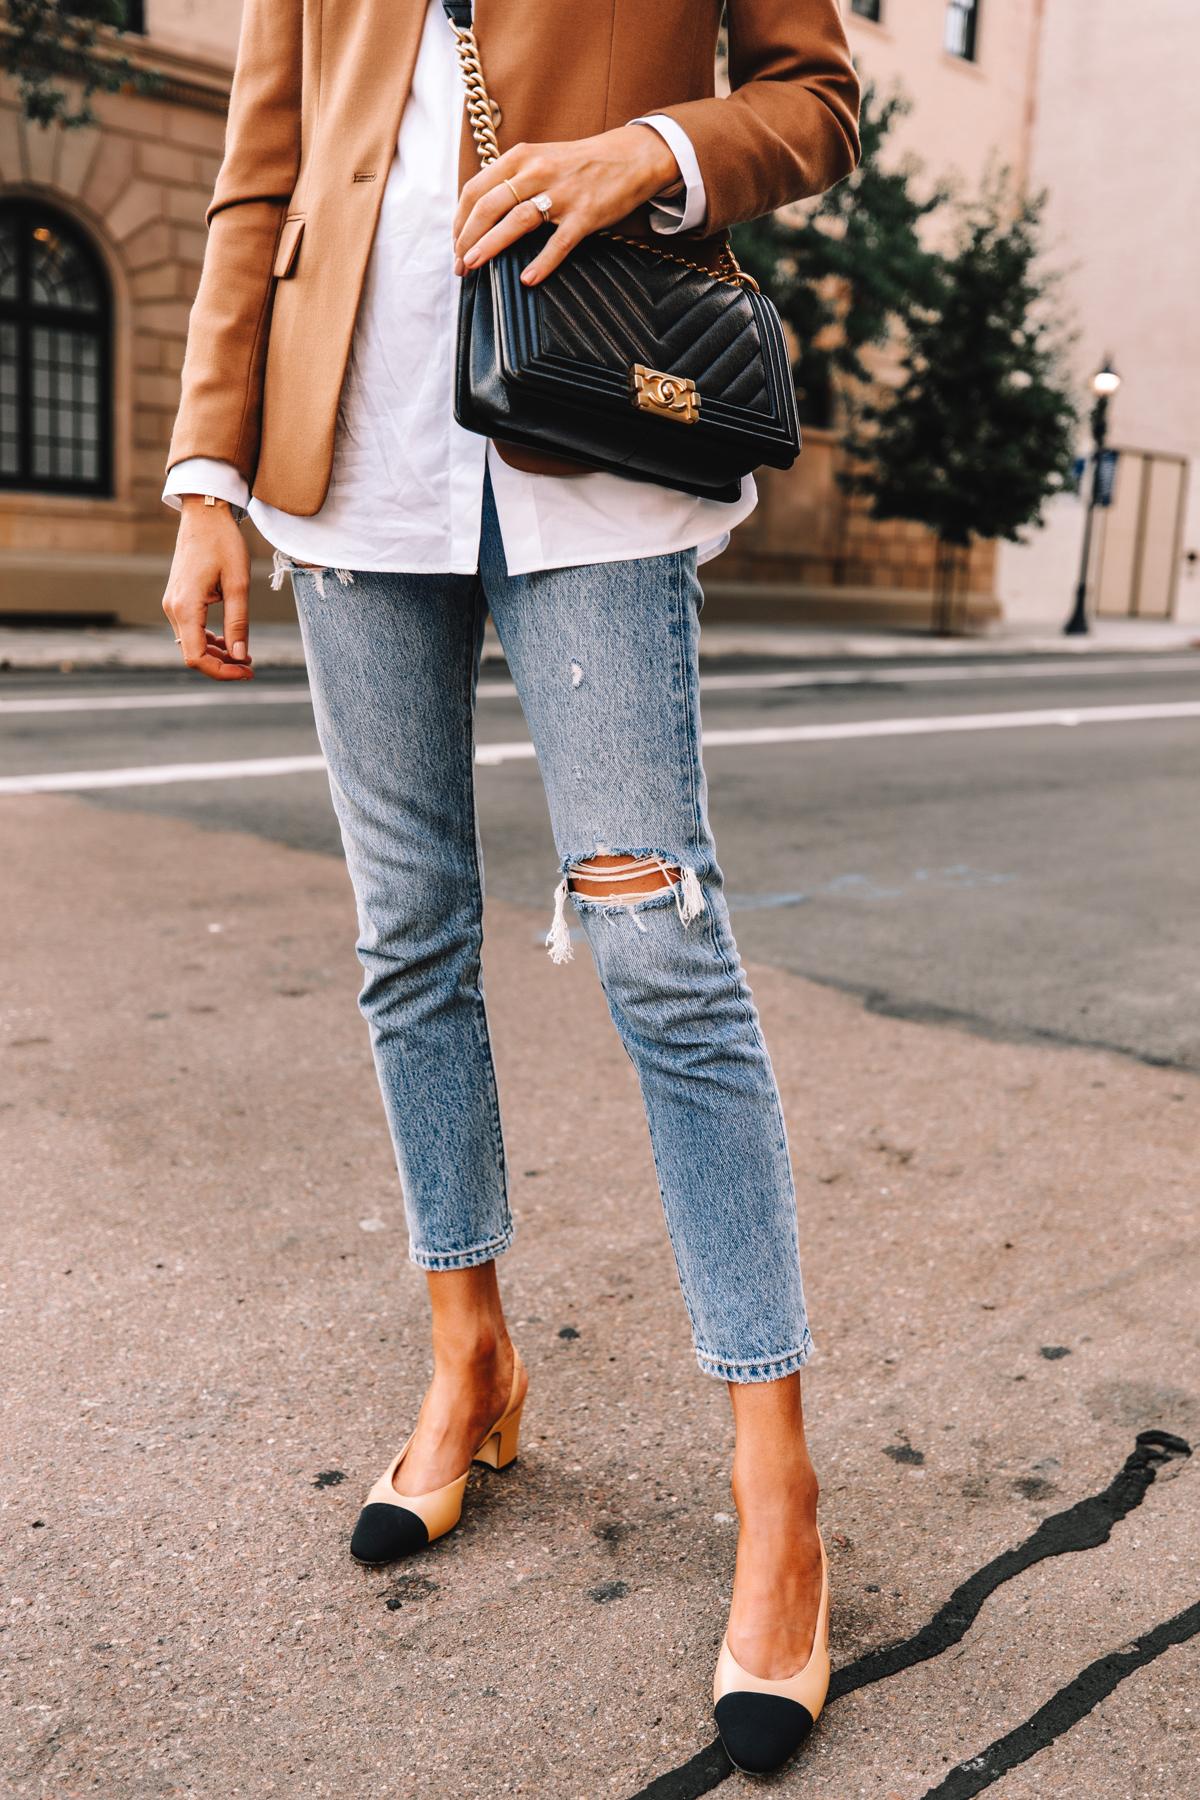 Fashion Jackson Wearing Jcrew Regent Blazer Camel White Shirt Levis 501 Ripped Jeans Chanel Slingbacks Chanel Black Boy Bag 1